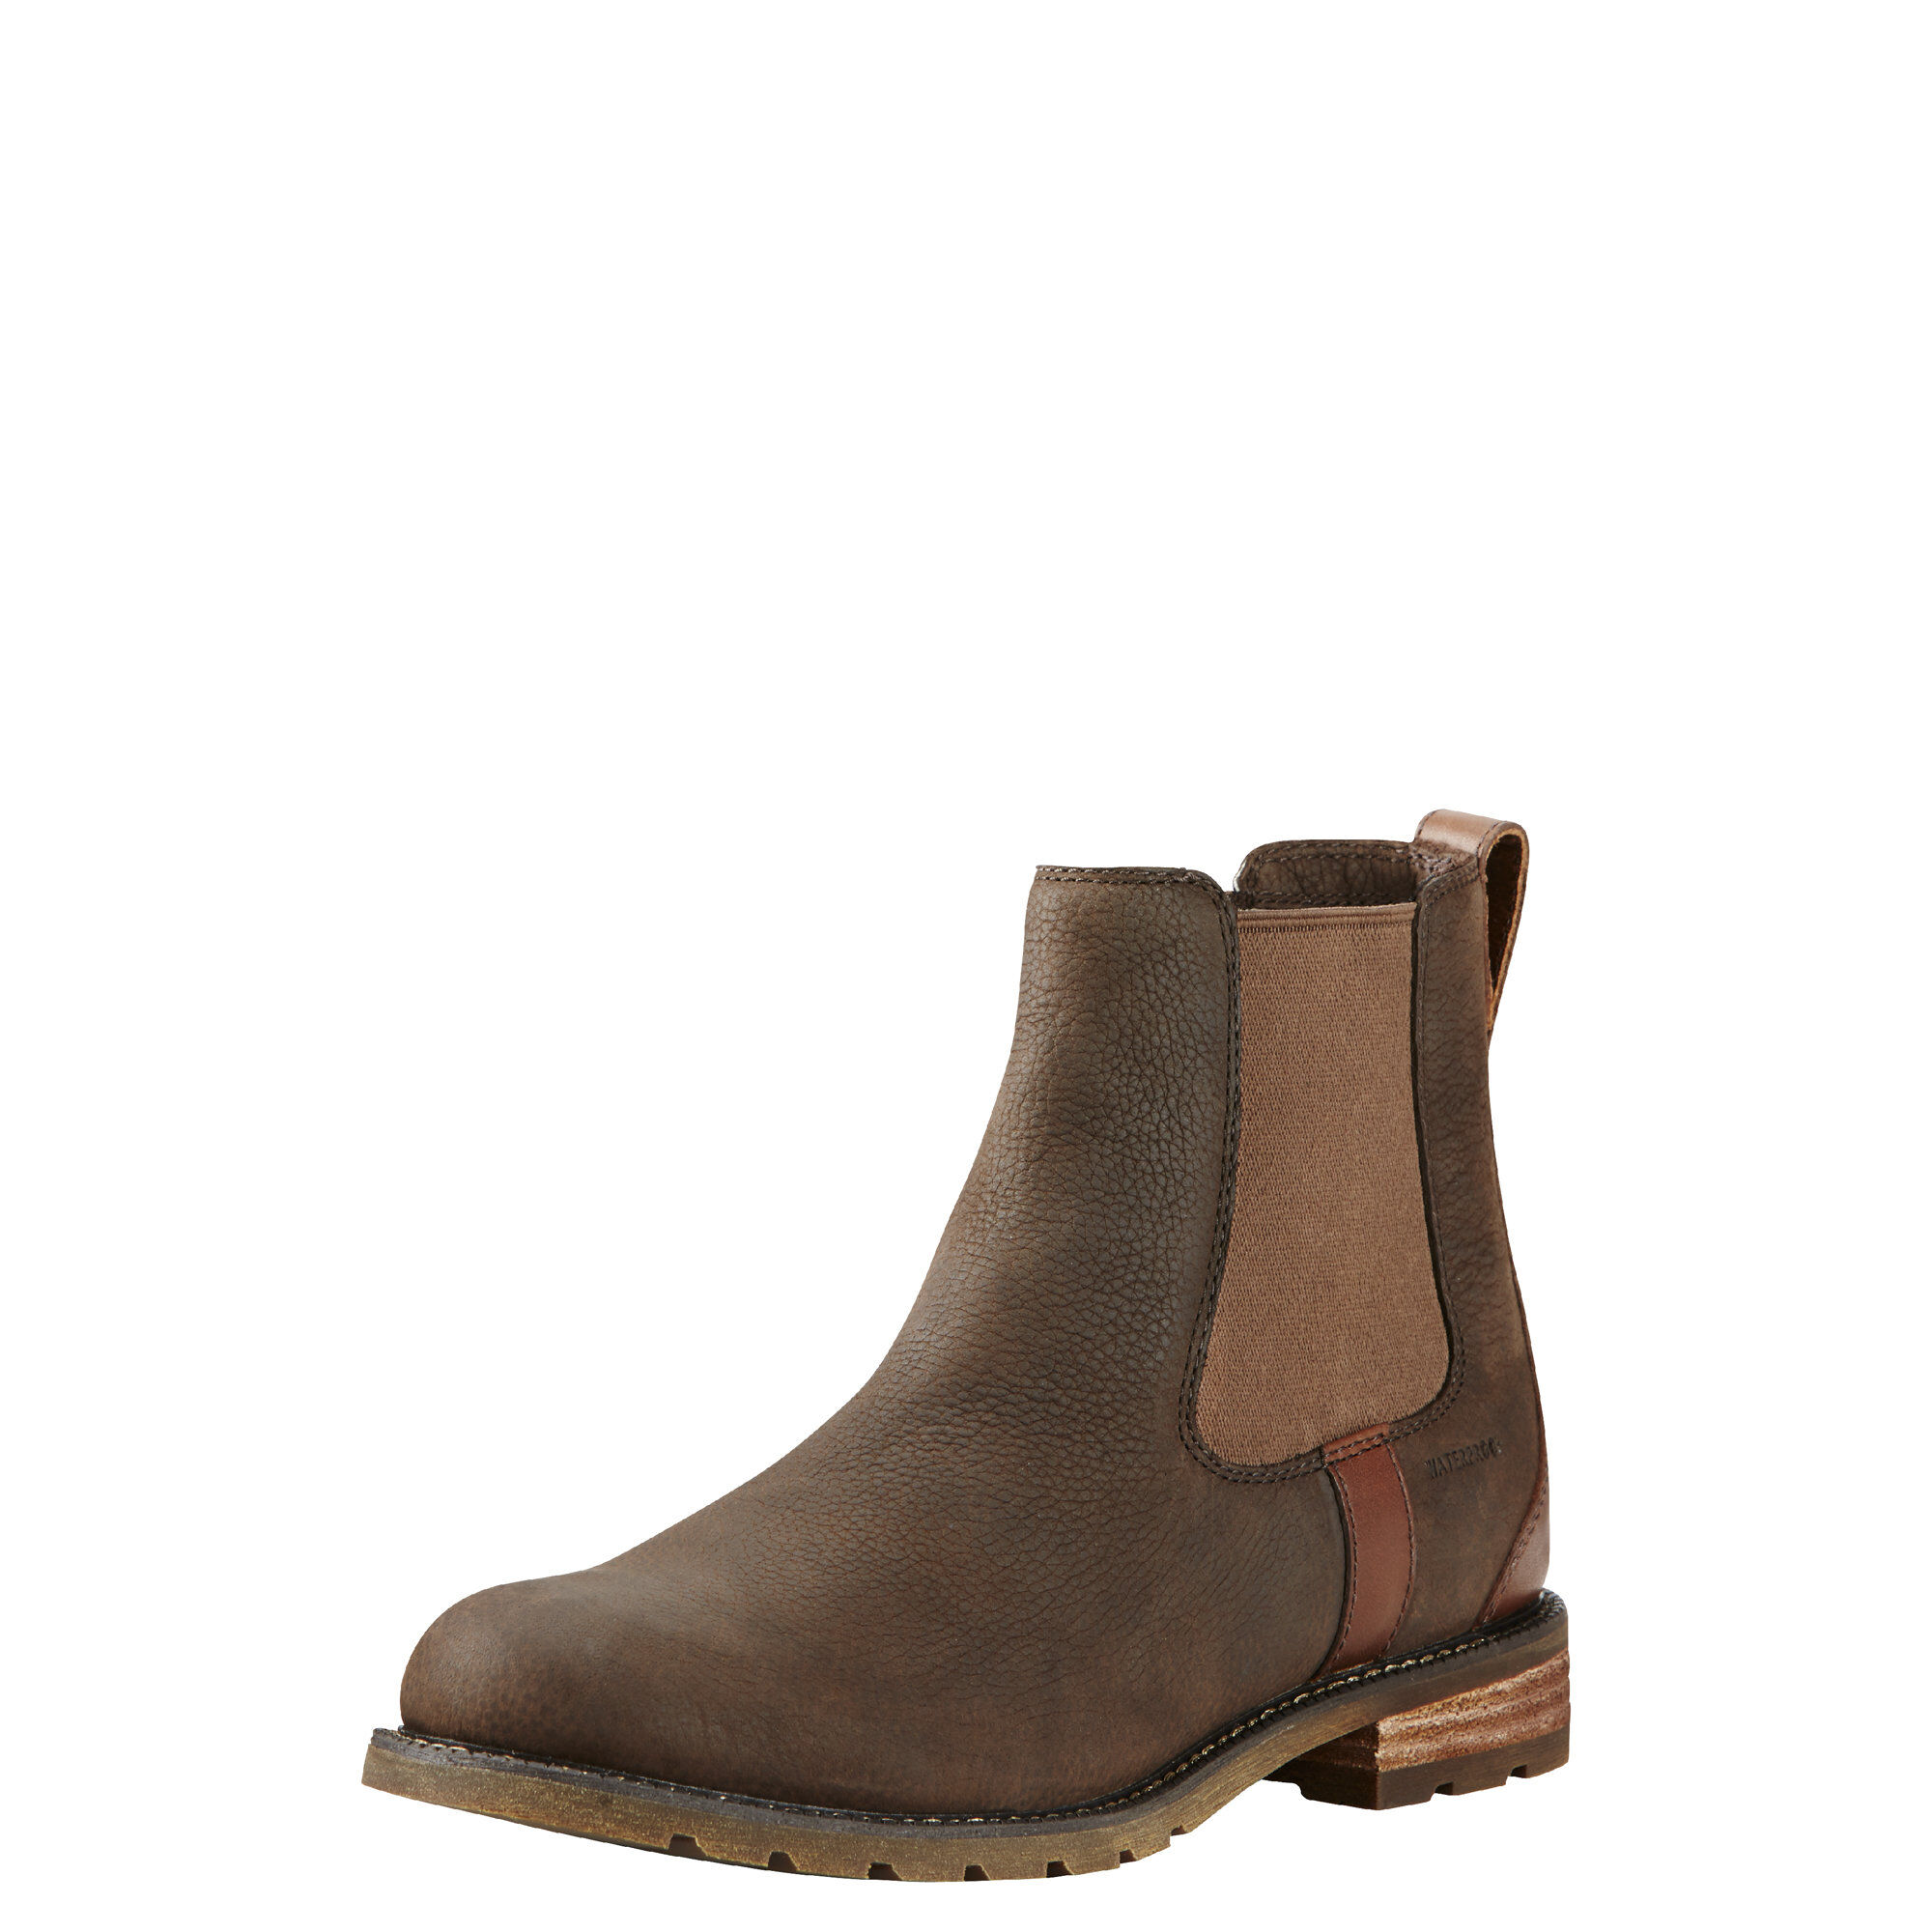 Wexford Waterproof Boot   Ariat